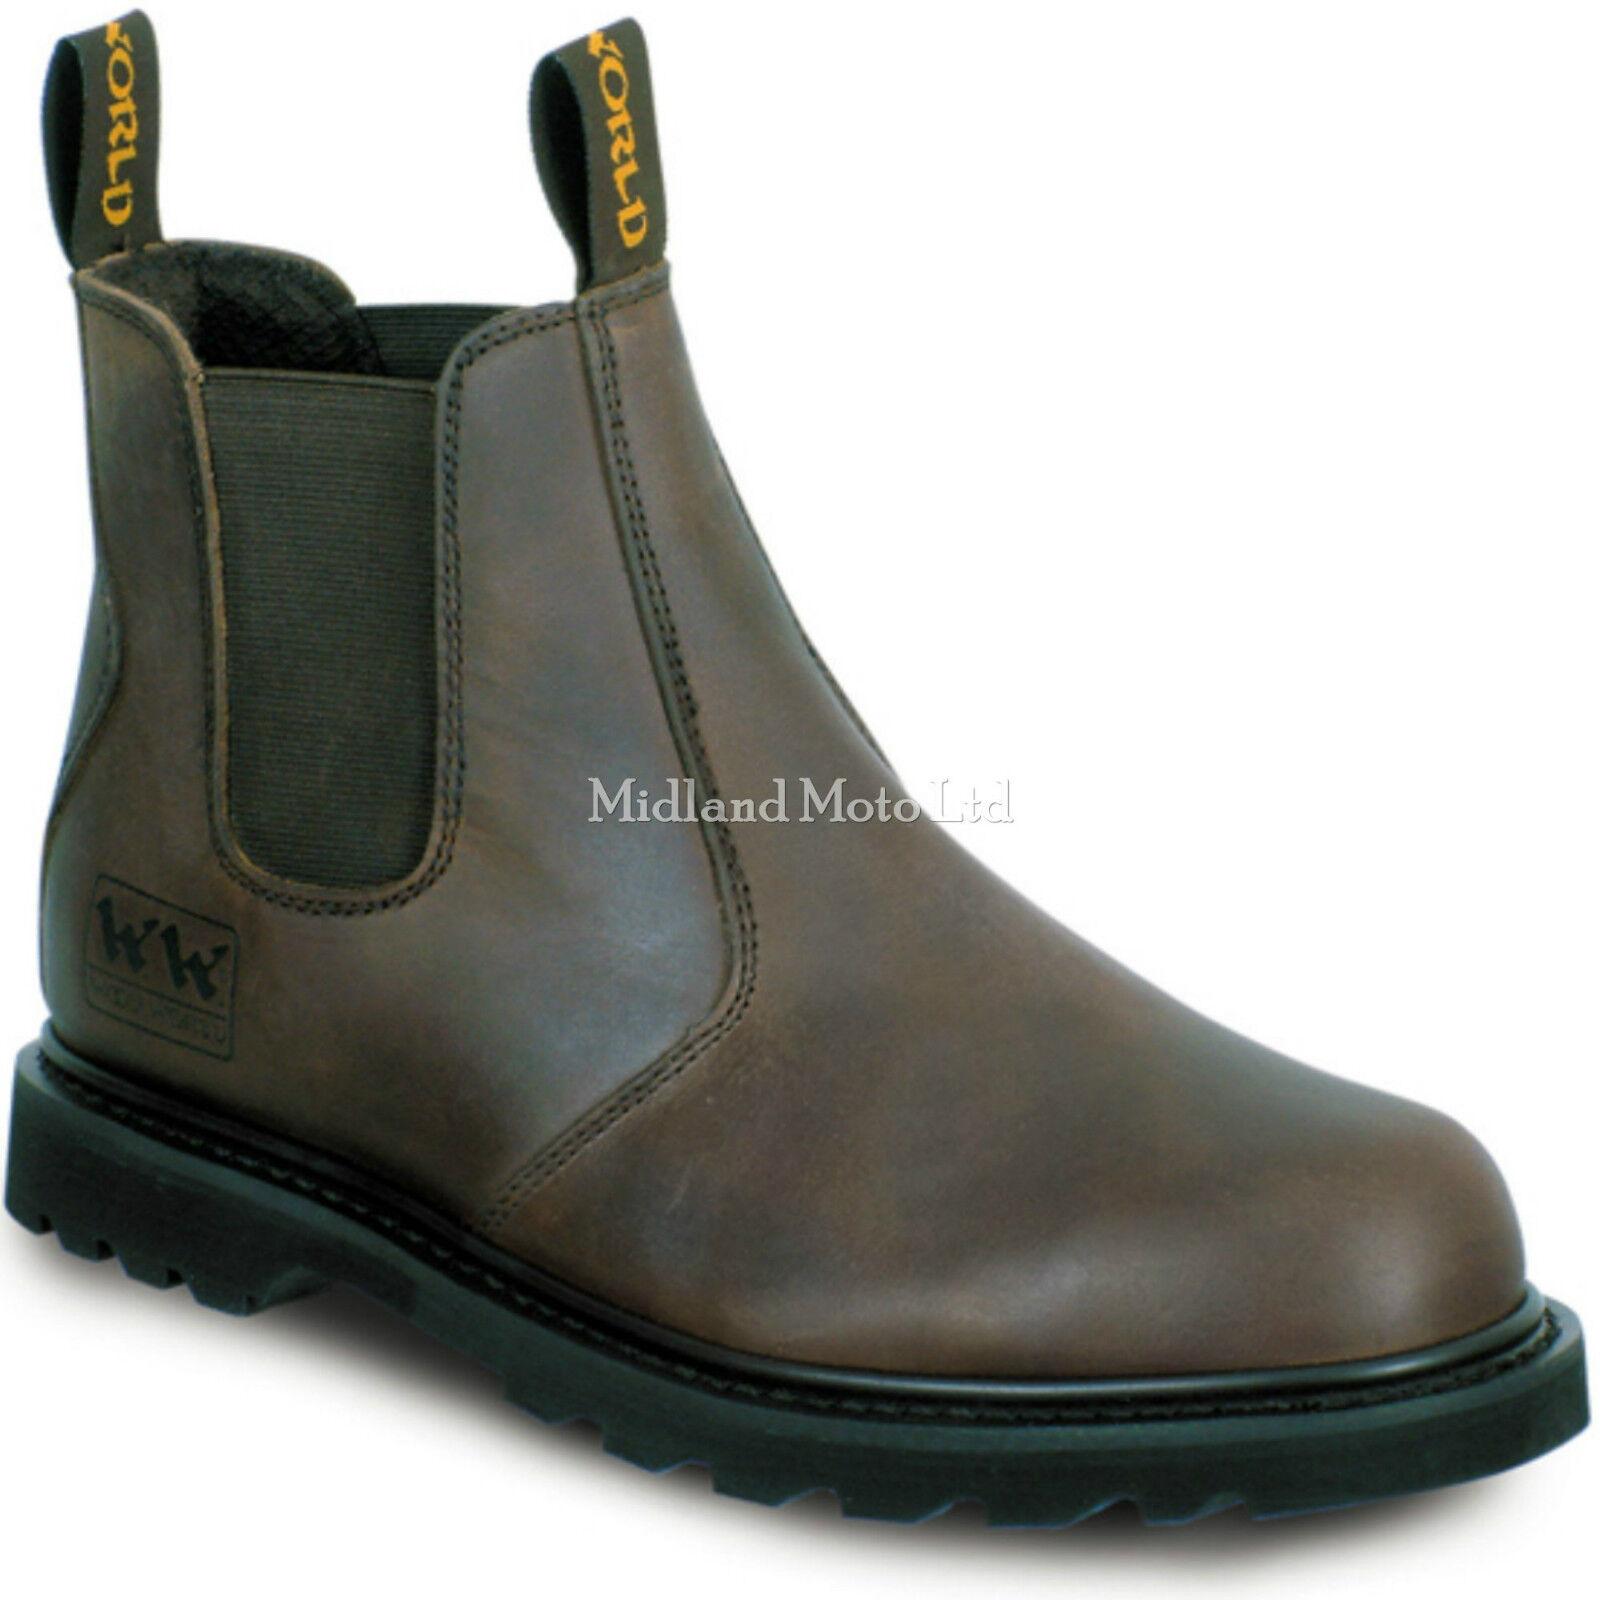 Goodyear Welted mundo Madera Marrón Distribuidor Tapa Puntera De Acero botas, tamaño 6 -13 WWD1-P.